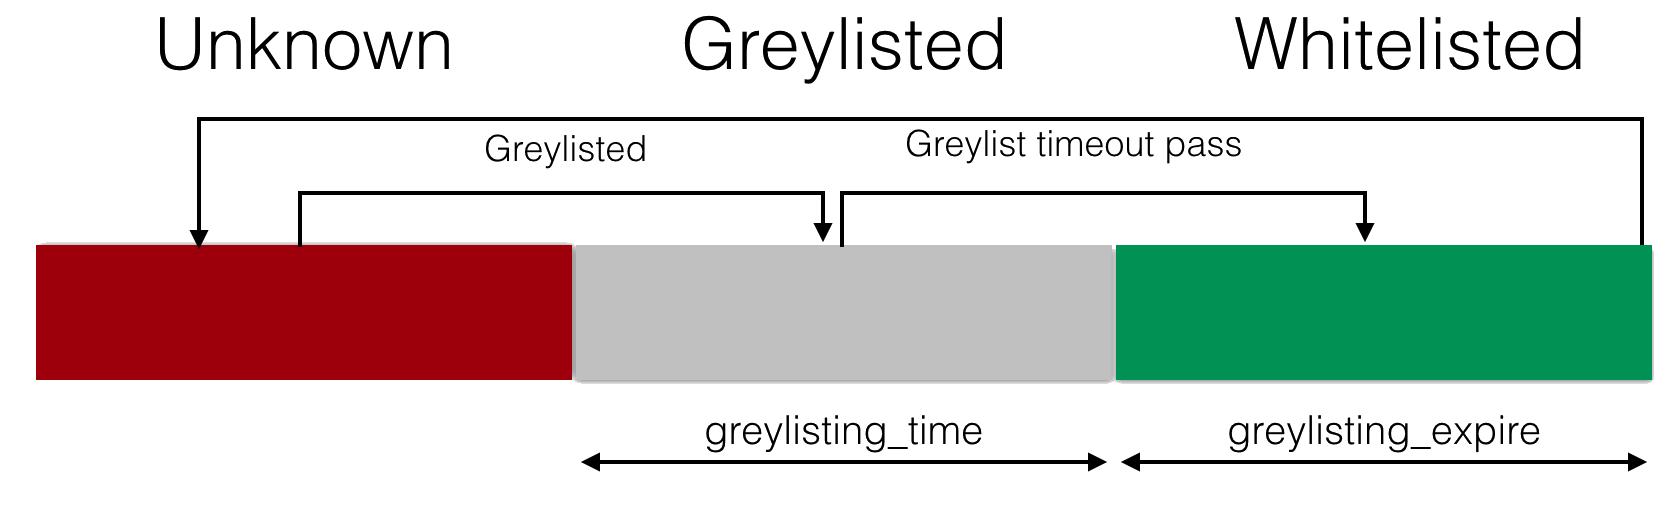 greylisting